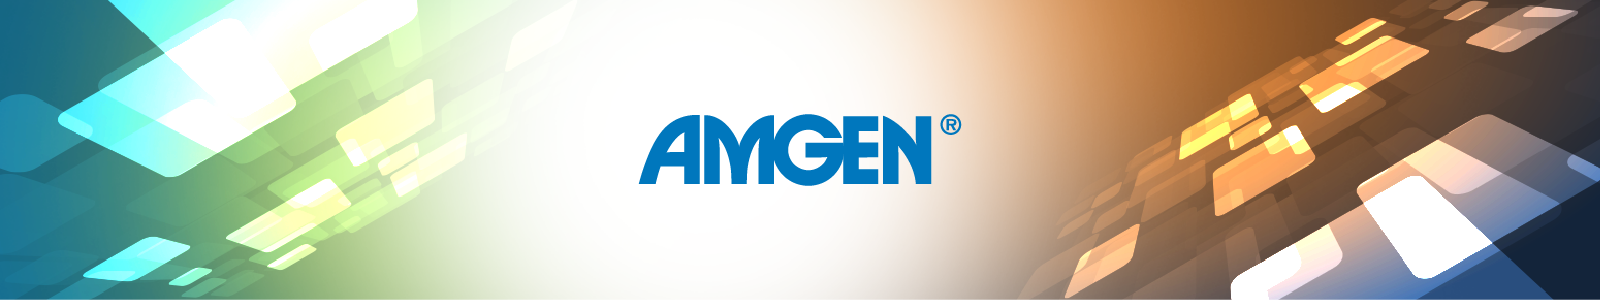 banner-amgen